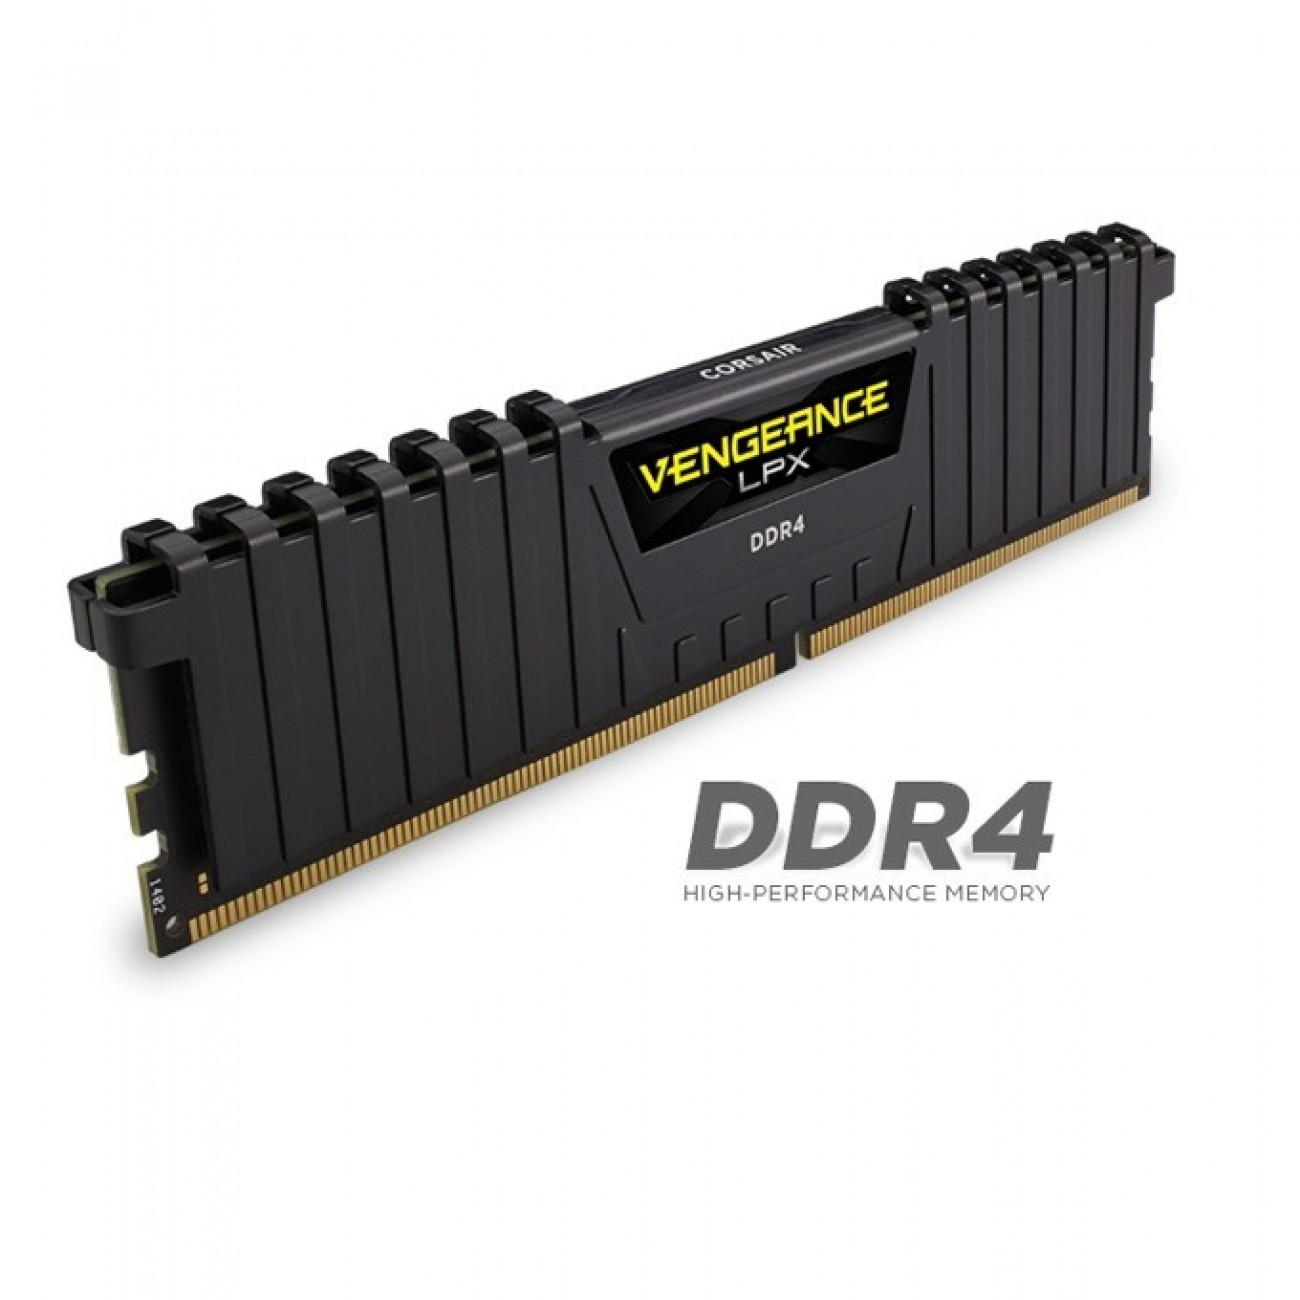 2x8GB DDR4 3000MHz, Corsair Vengeance LPX CMK16GX4M2B3000C15, 1.35V в Настолни компютри Памети -    Alleop